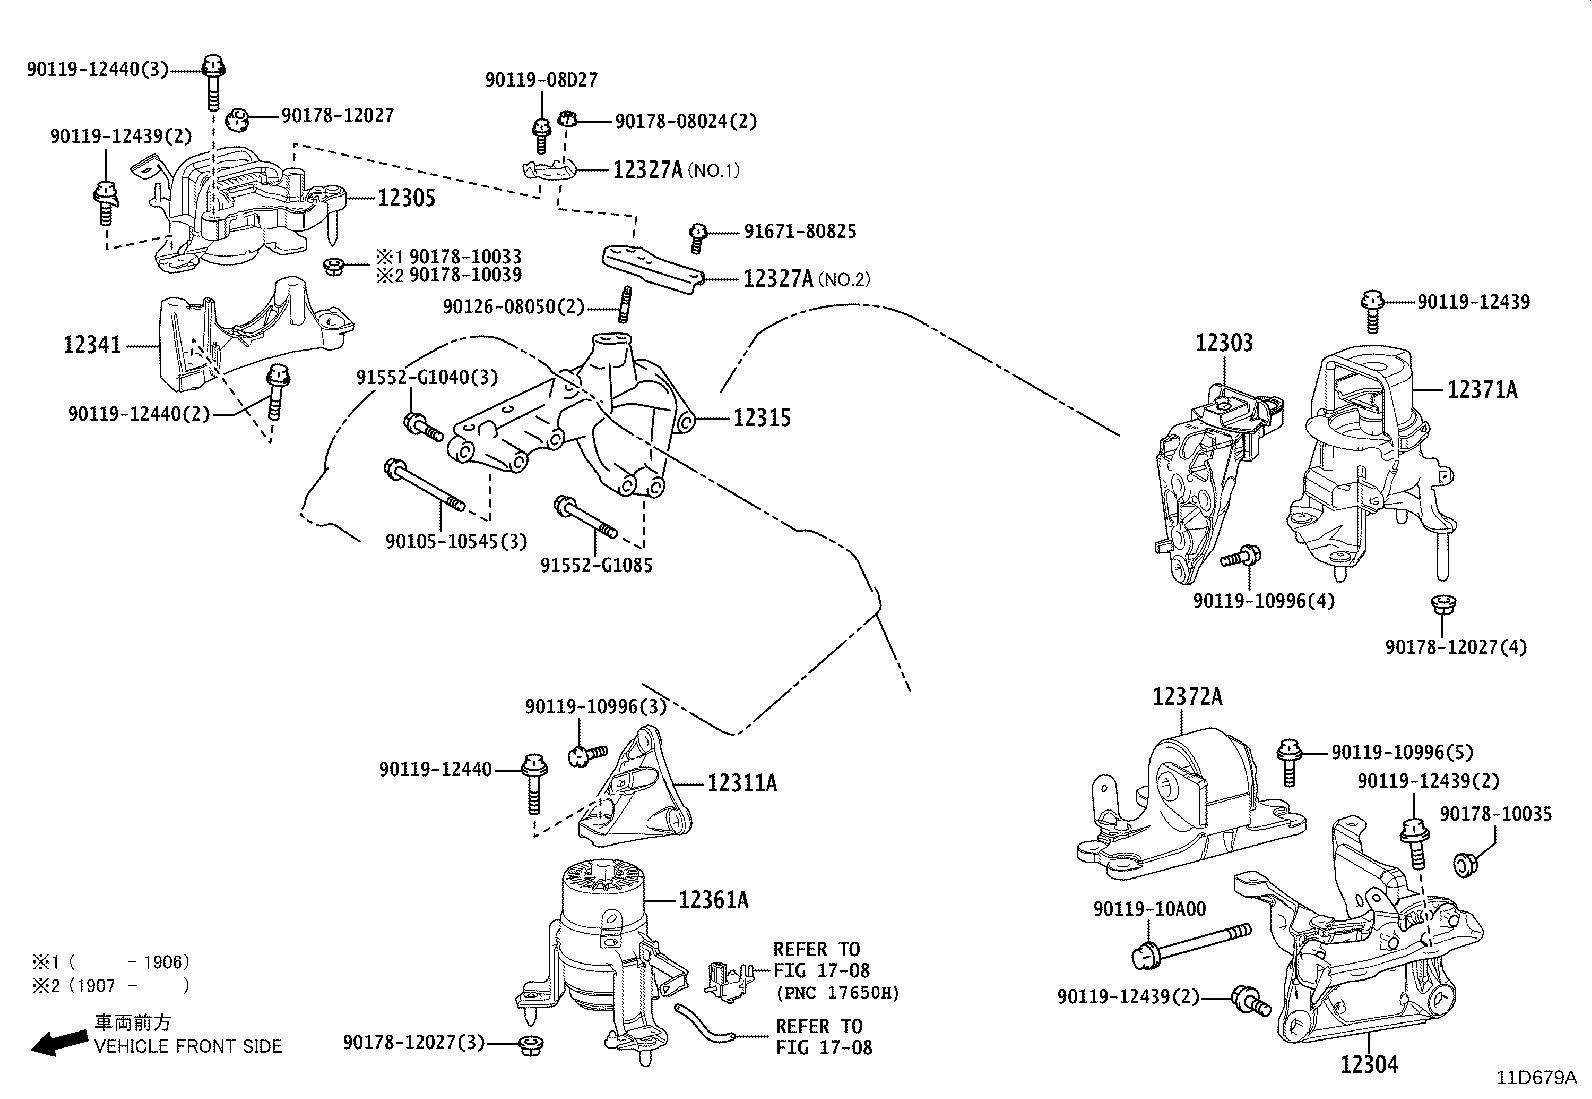 12341f0010 - Spacer  Engine Mounting  Gen  Eur  Arl